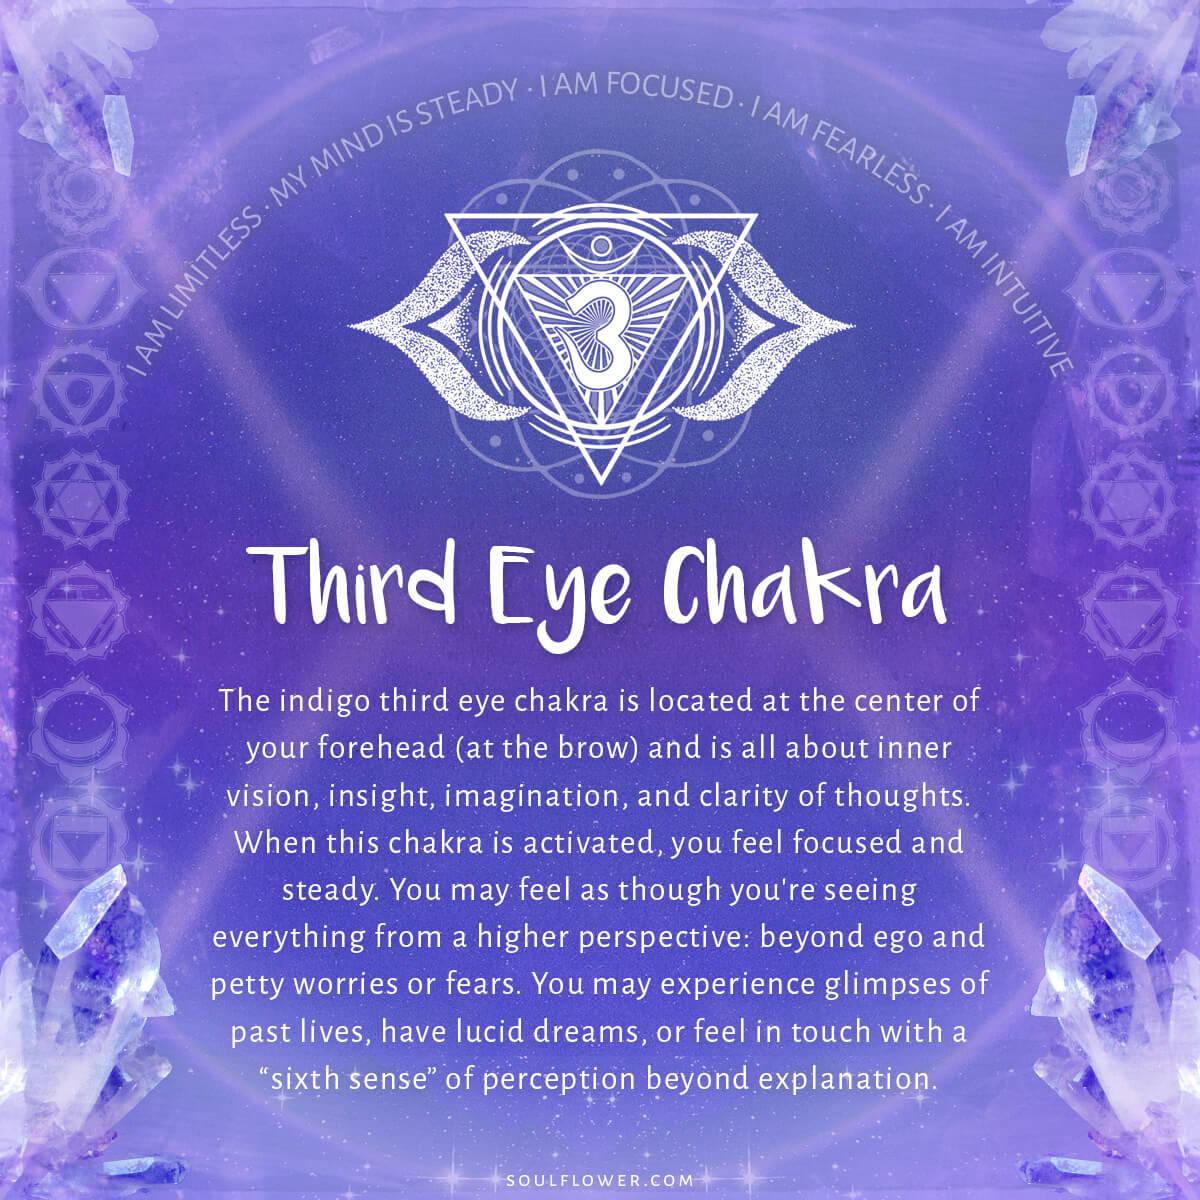 6th chakra third eye chakra chart meanings soul flower blog